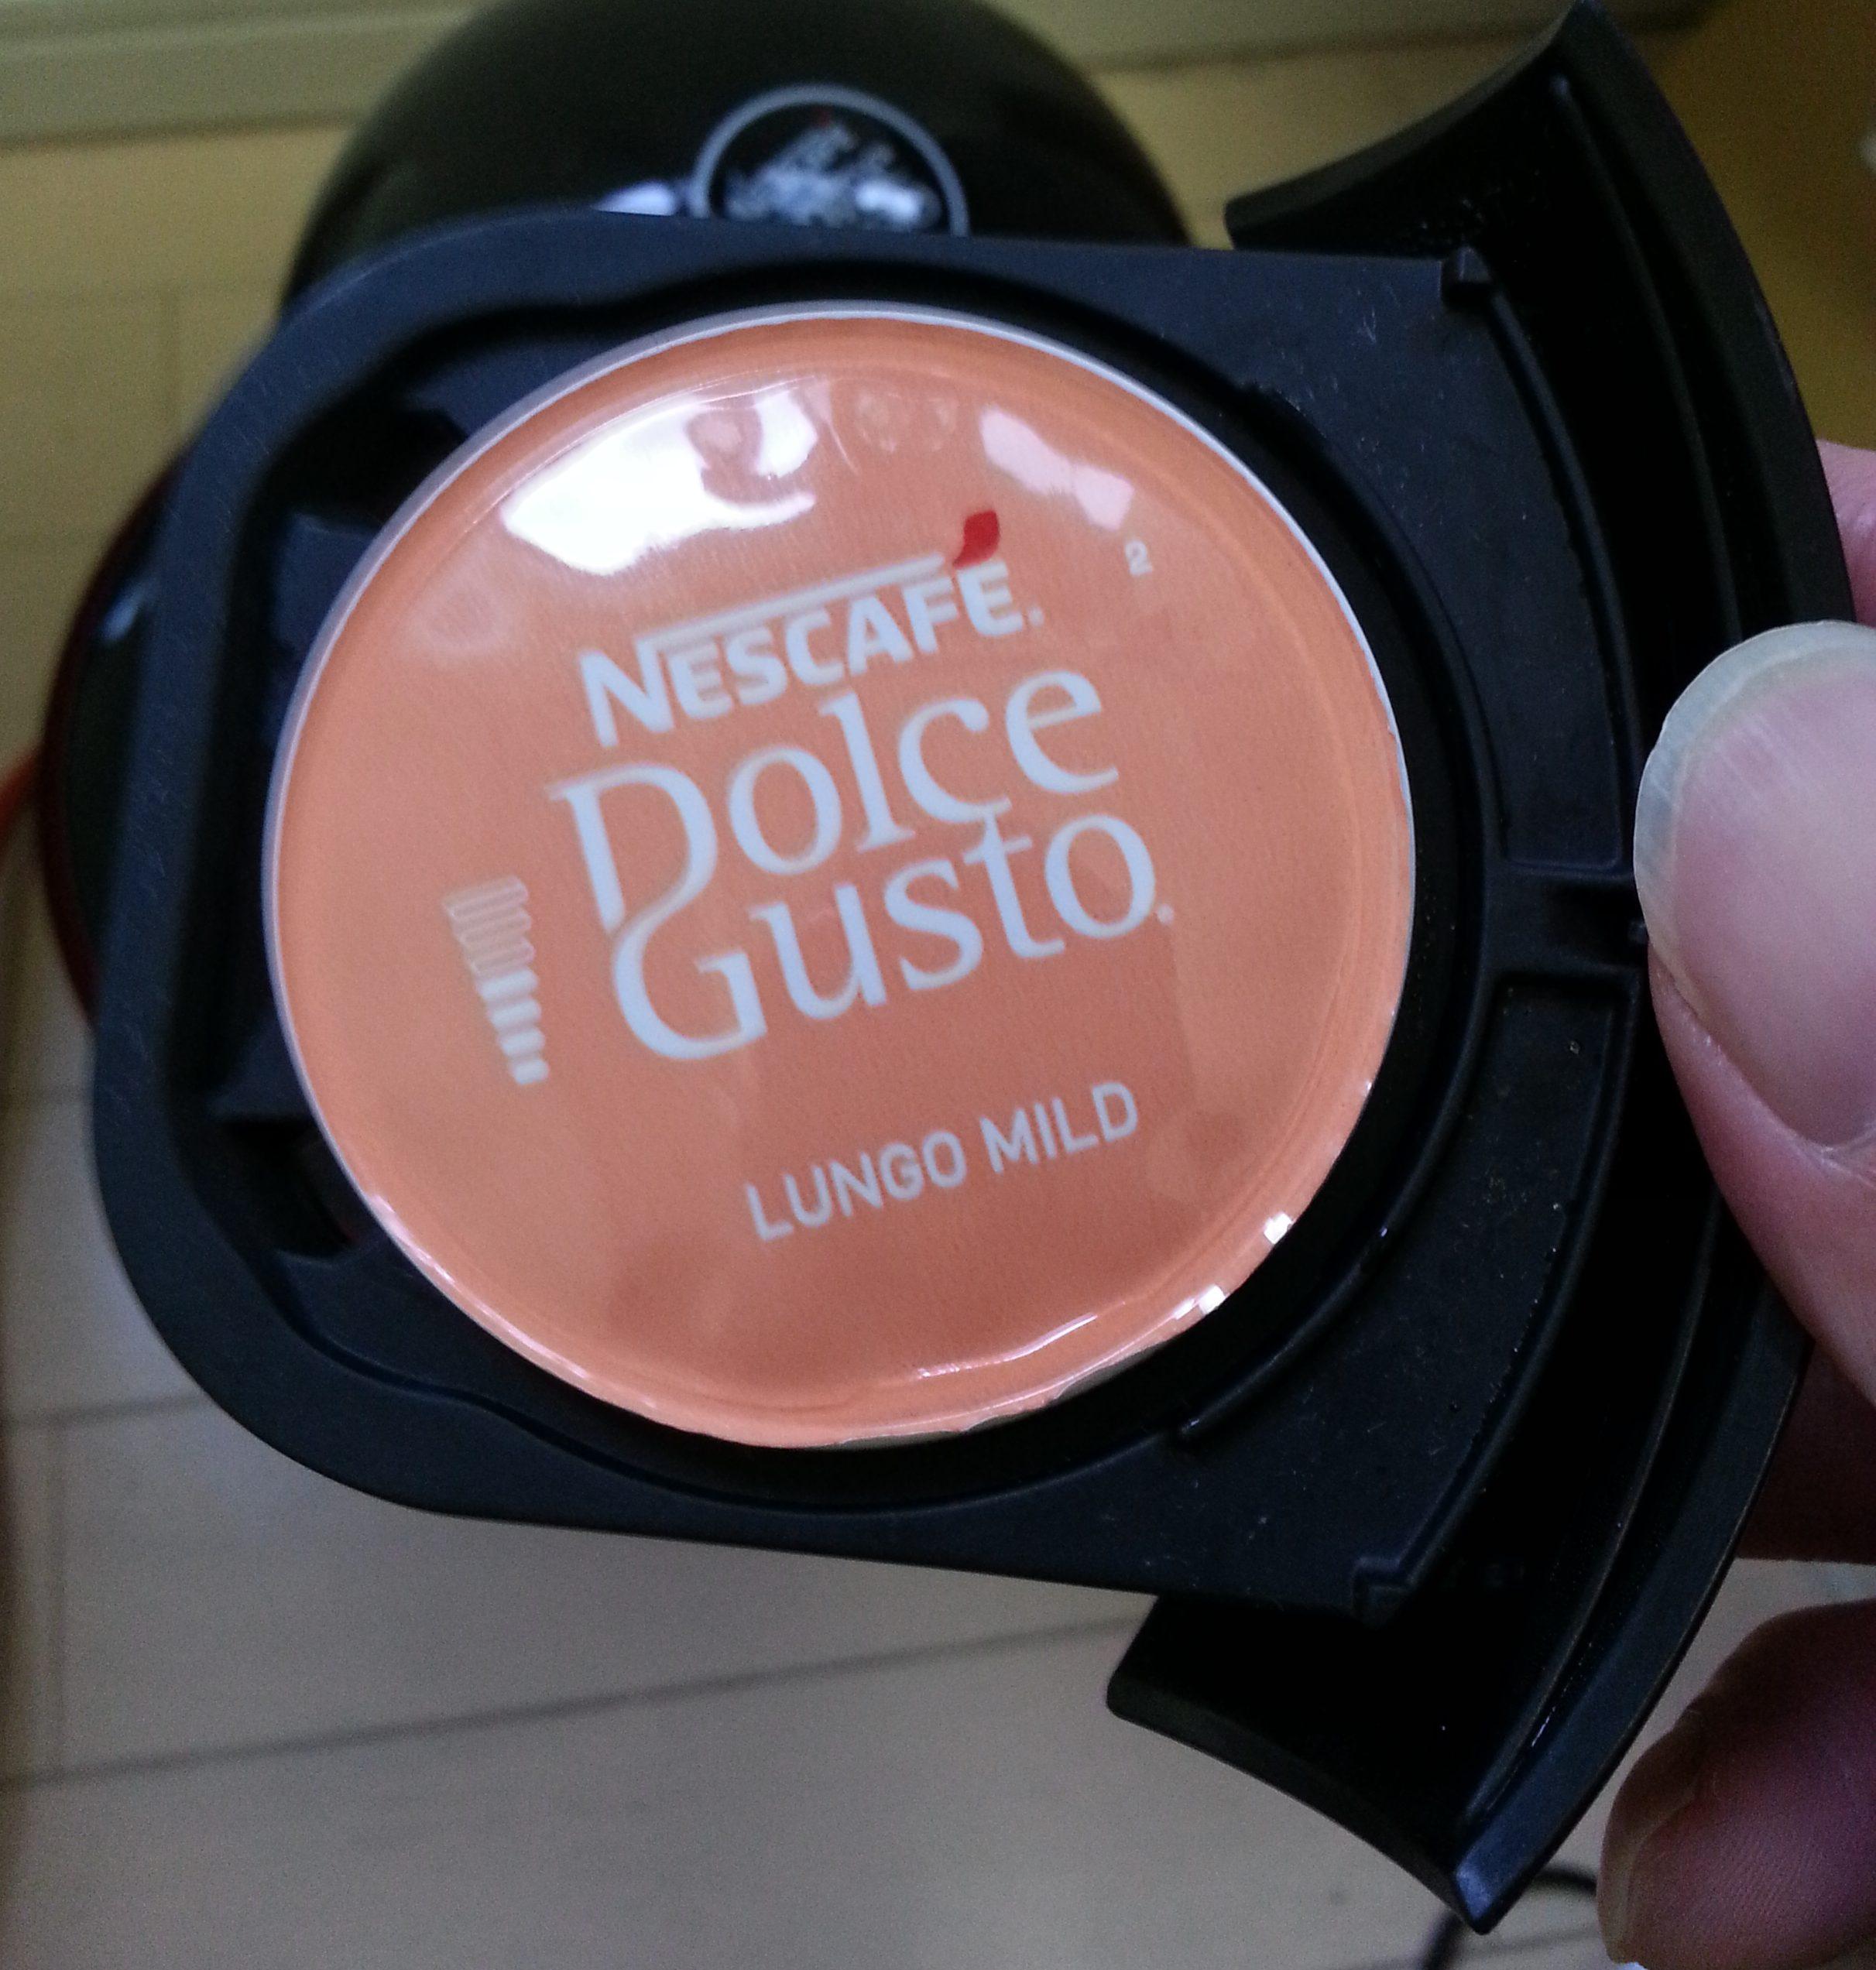 nescafe-dolcegusto-lungomild2